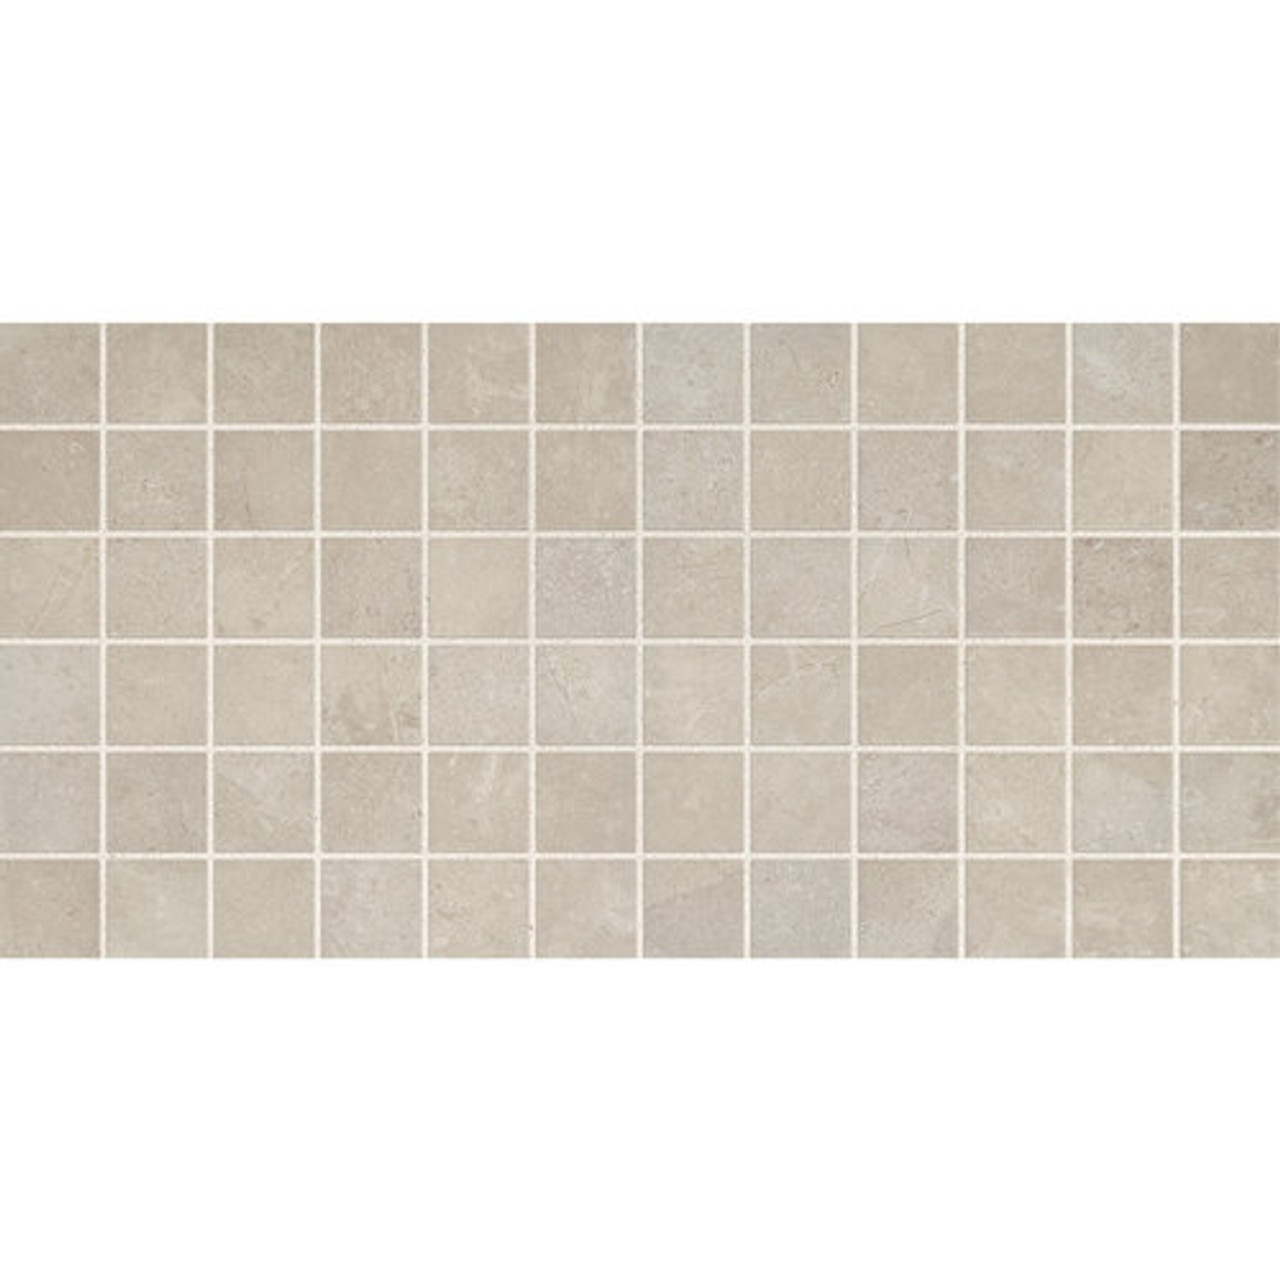 affinity gray ceramic mosaic 2x2